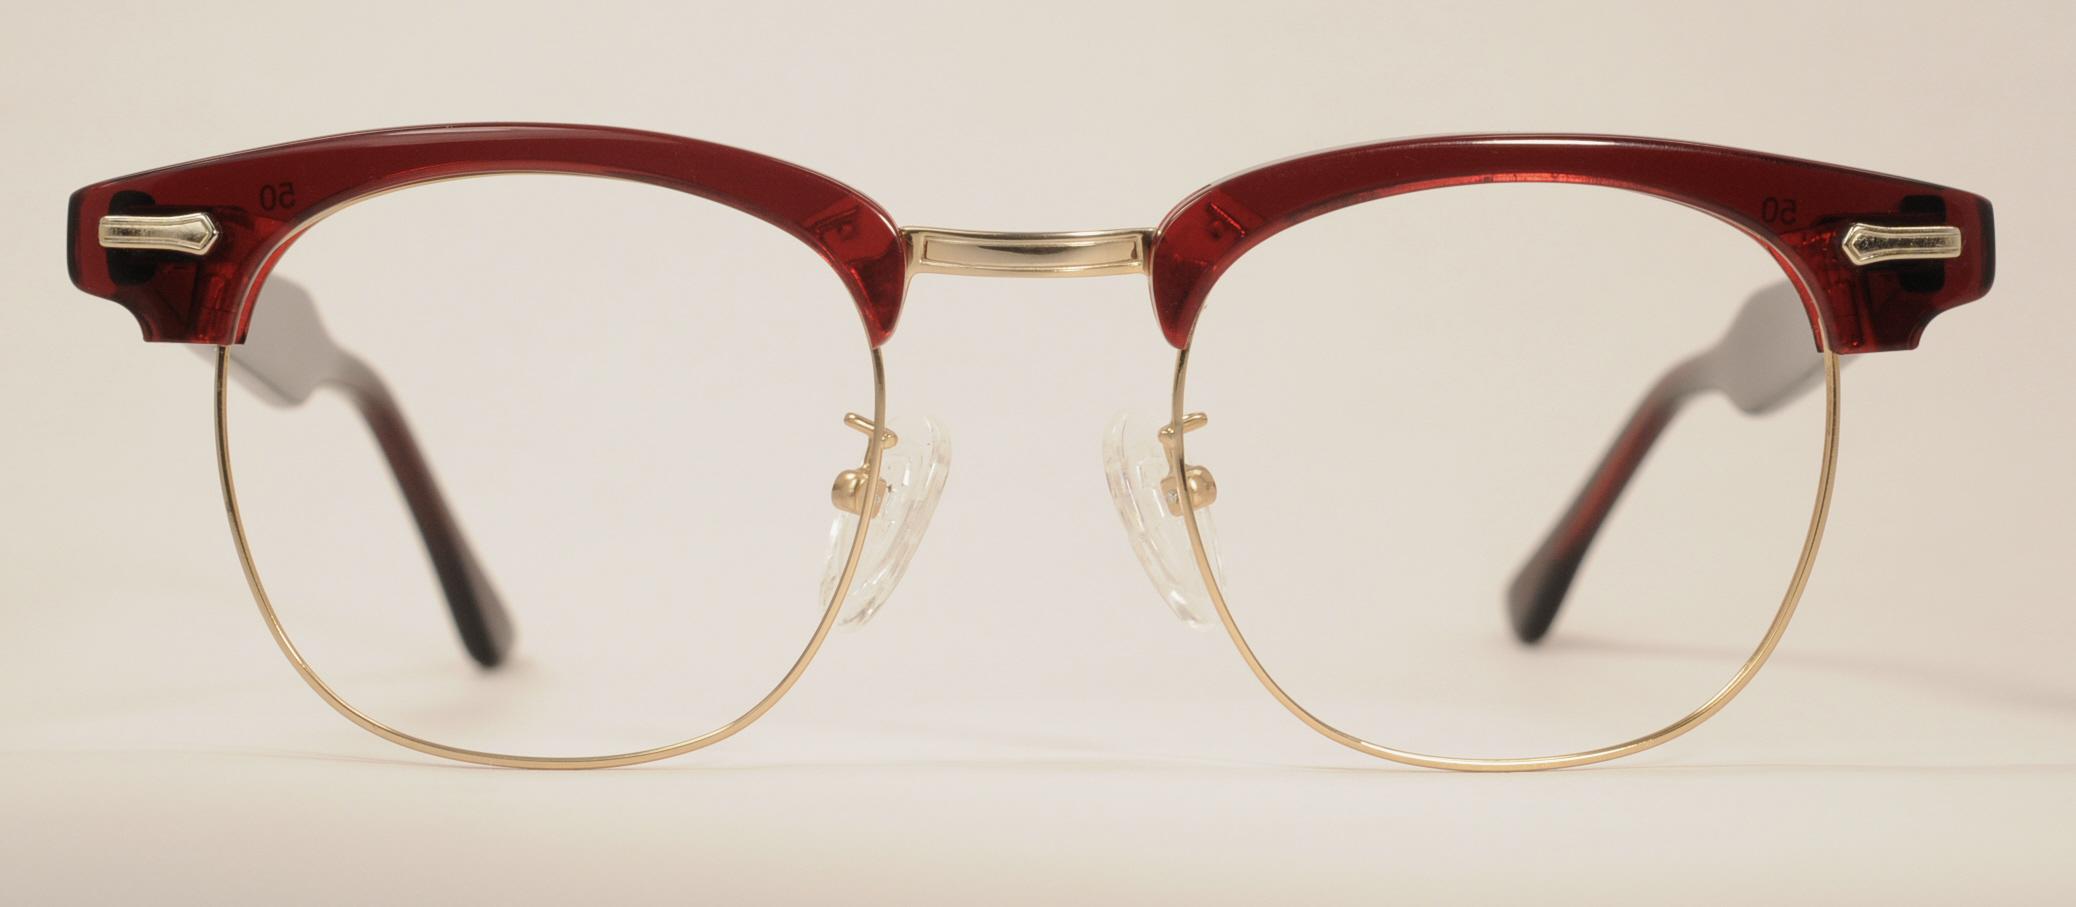 df4941f19e8 Optometrist Attic - SHURON RONSIR ZYL G-MAN CORDOVA COMBINATION EYEGLASSES